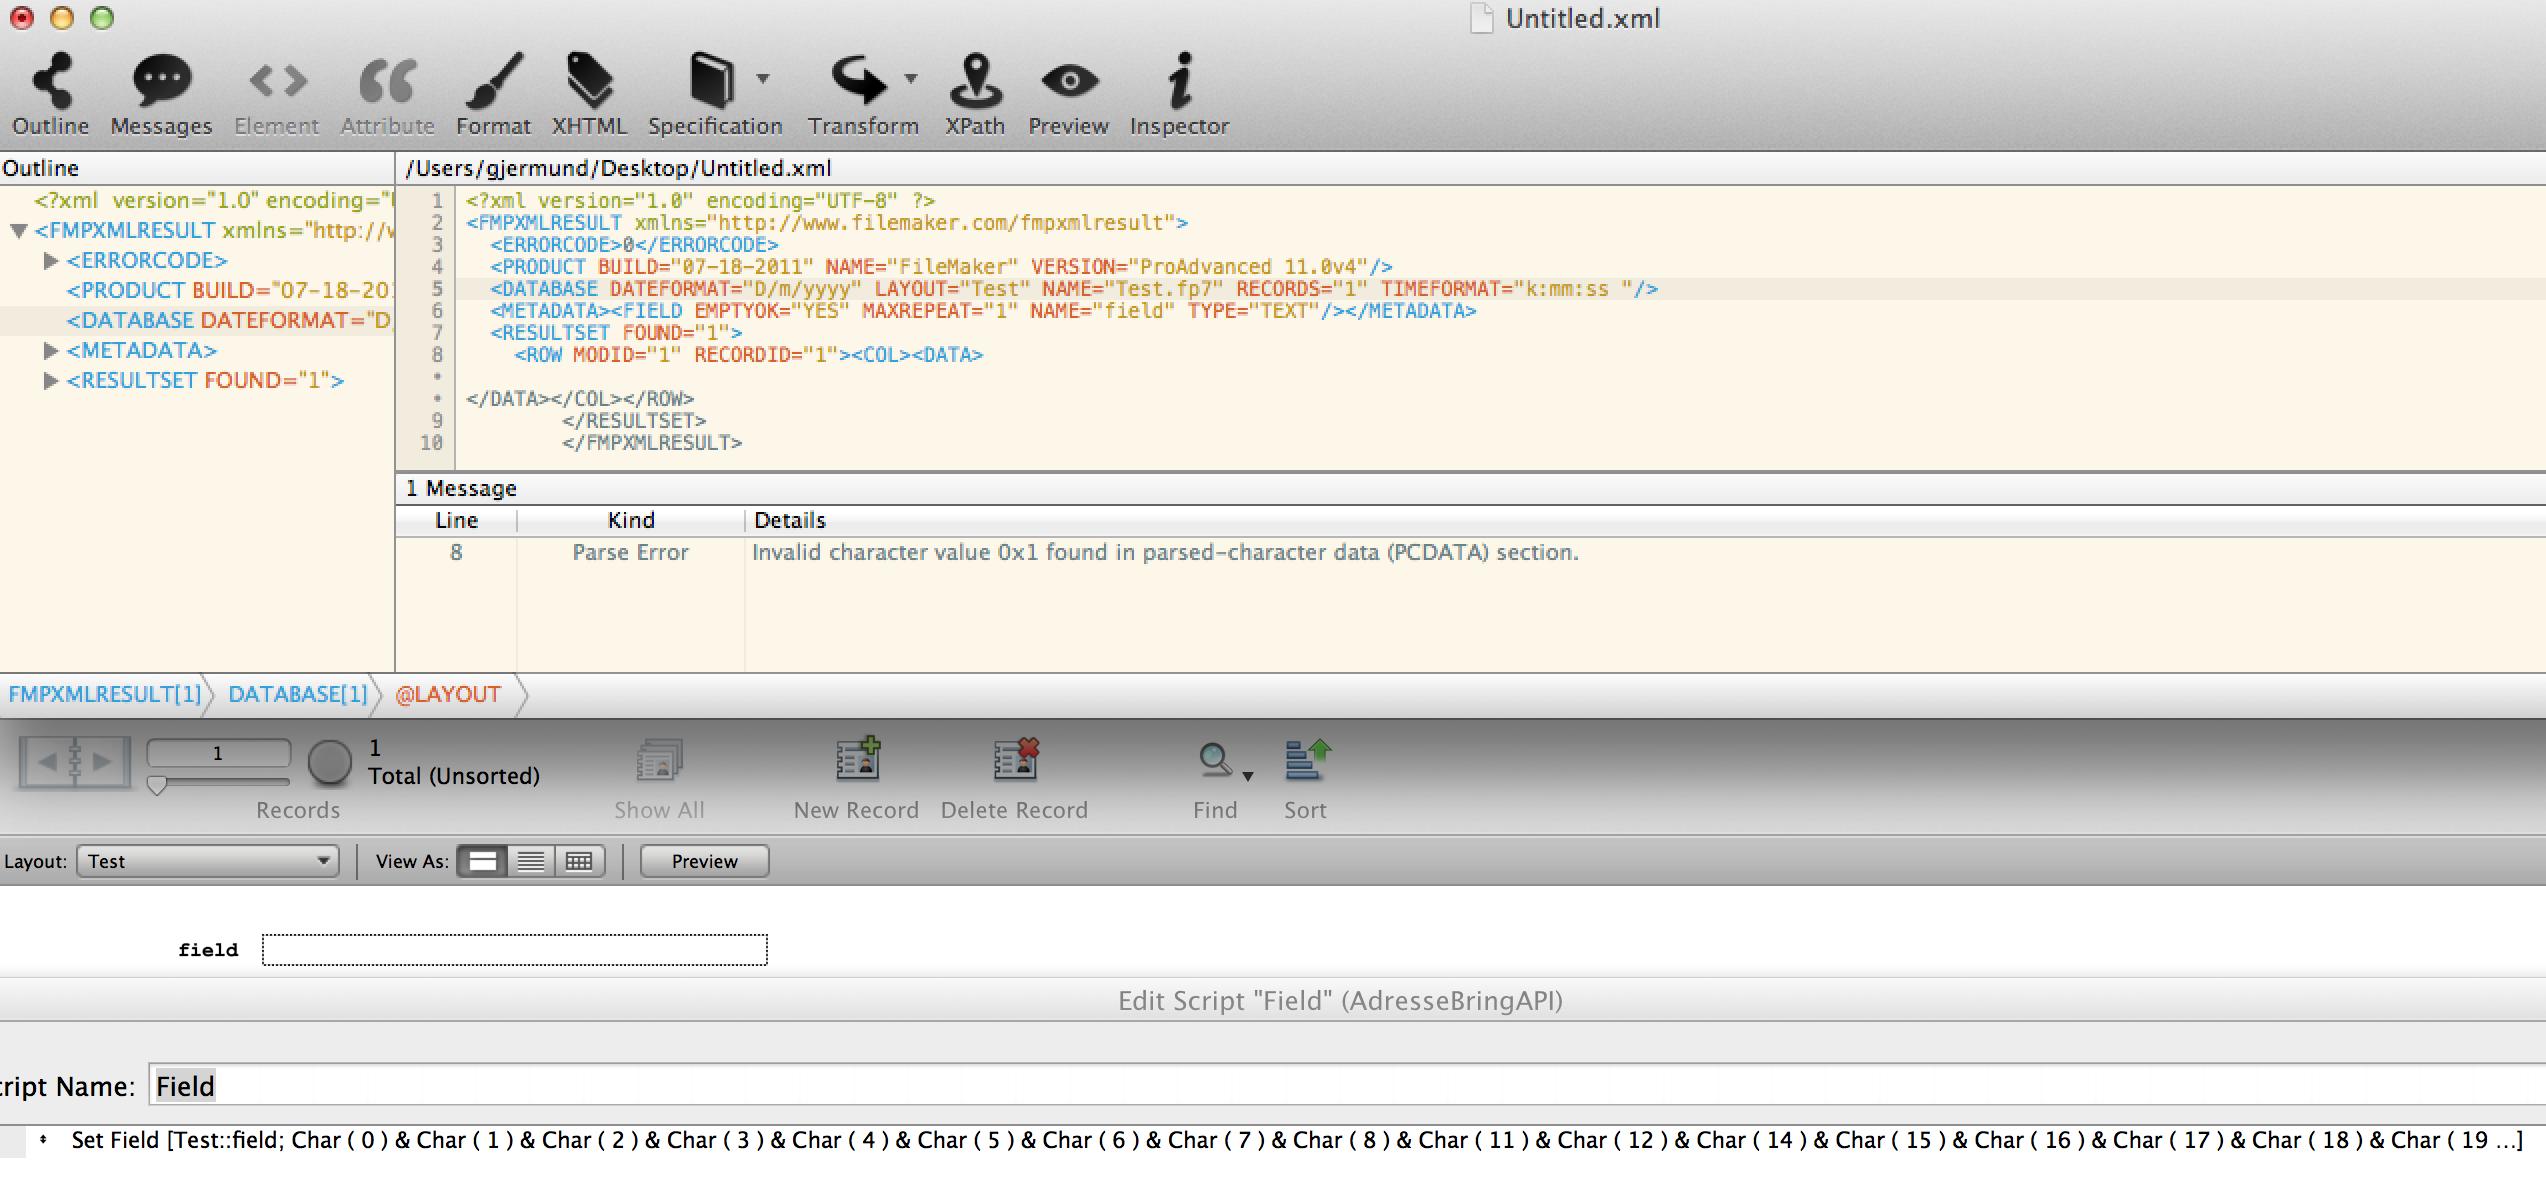 0x0 - illegal xml character - XML/XSL - FMForums.com